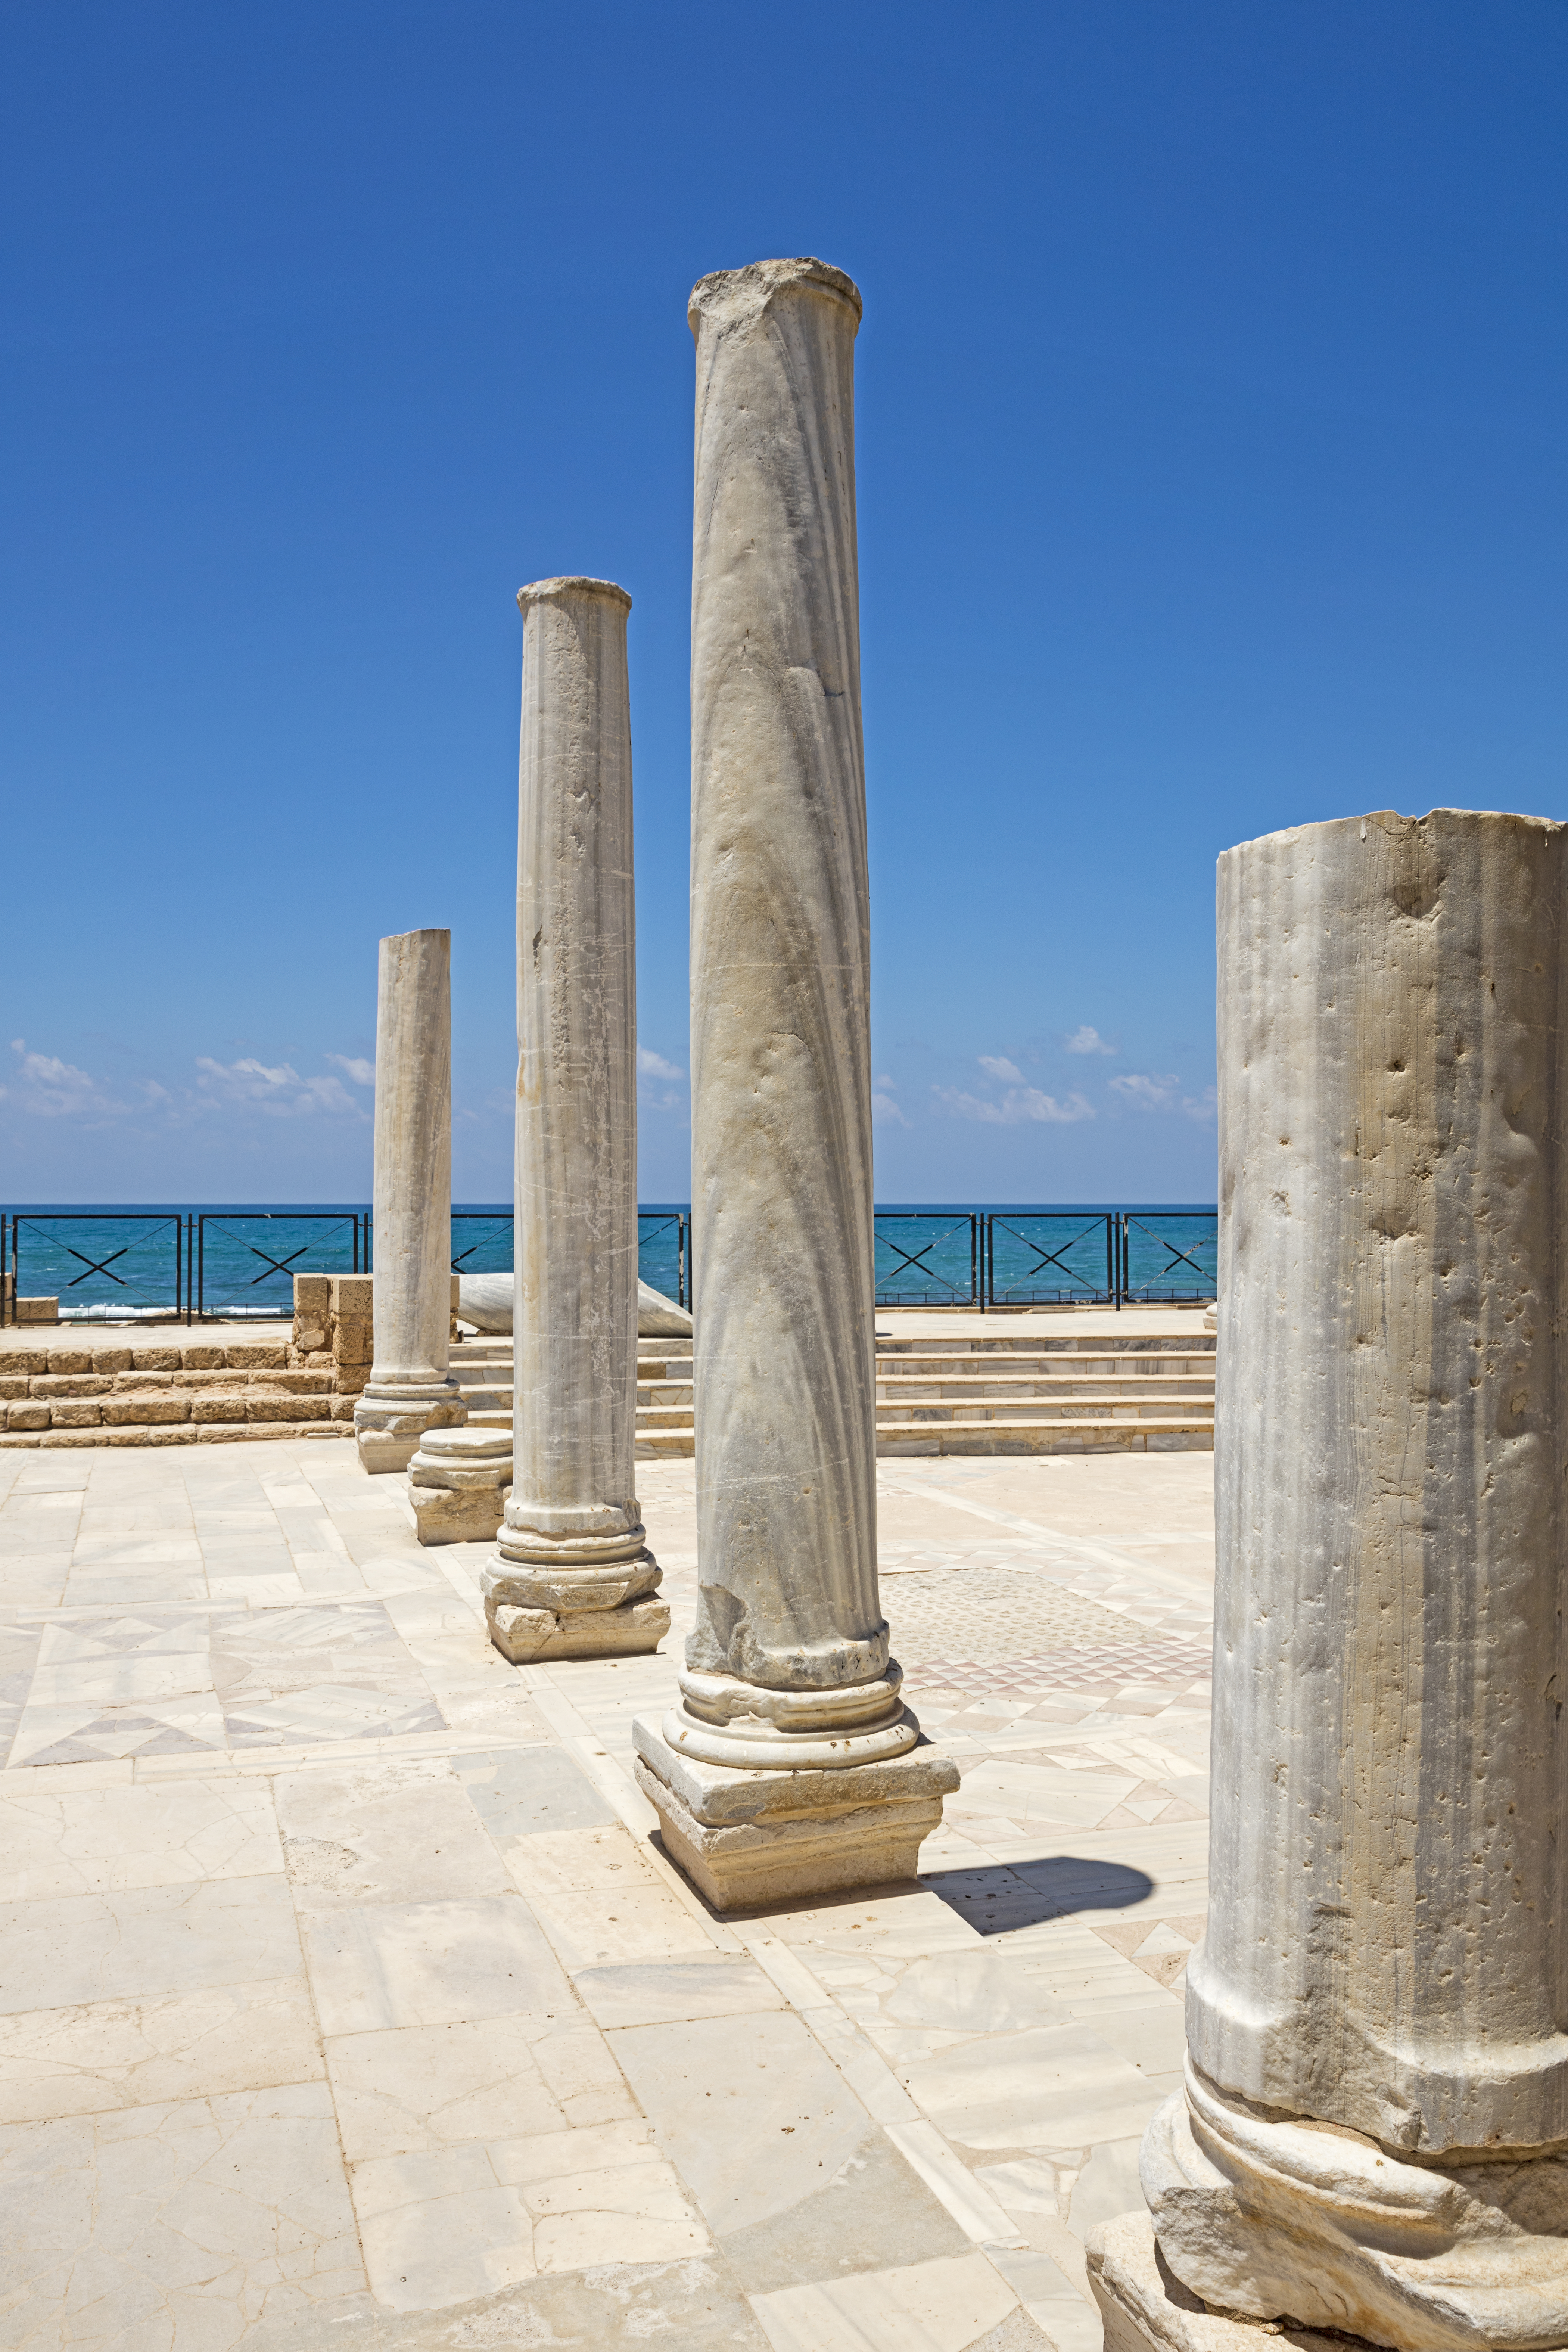 caesarea maritima columns isr  caesarea caesarea maritima columns: american colonial homes brandon inge